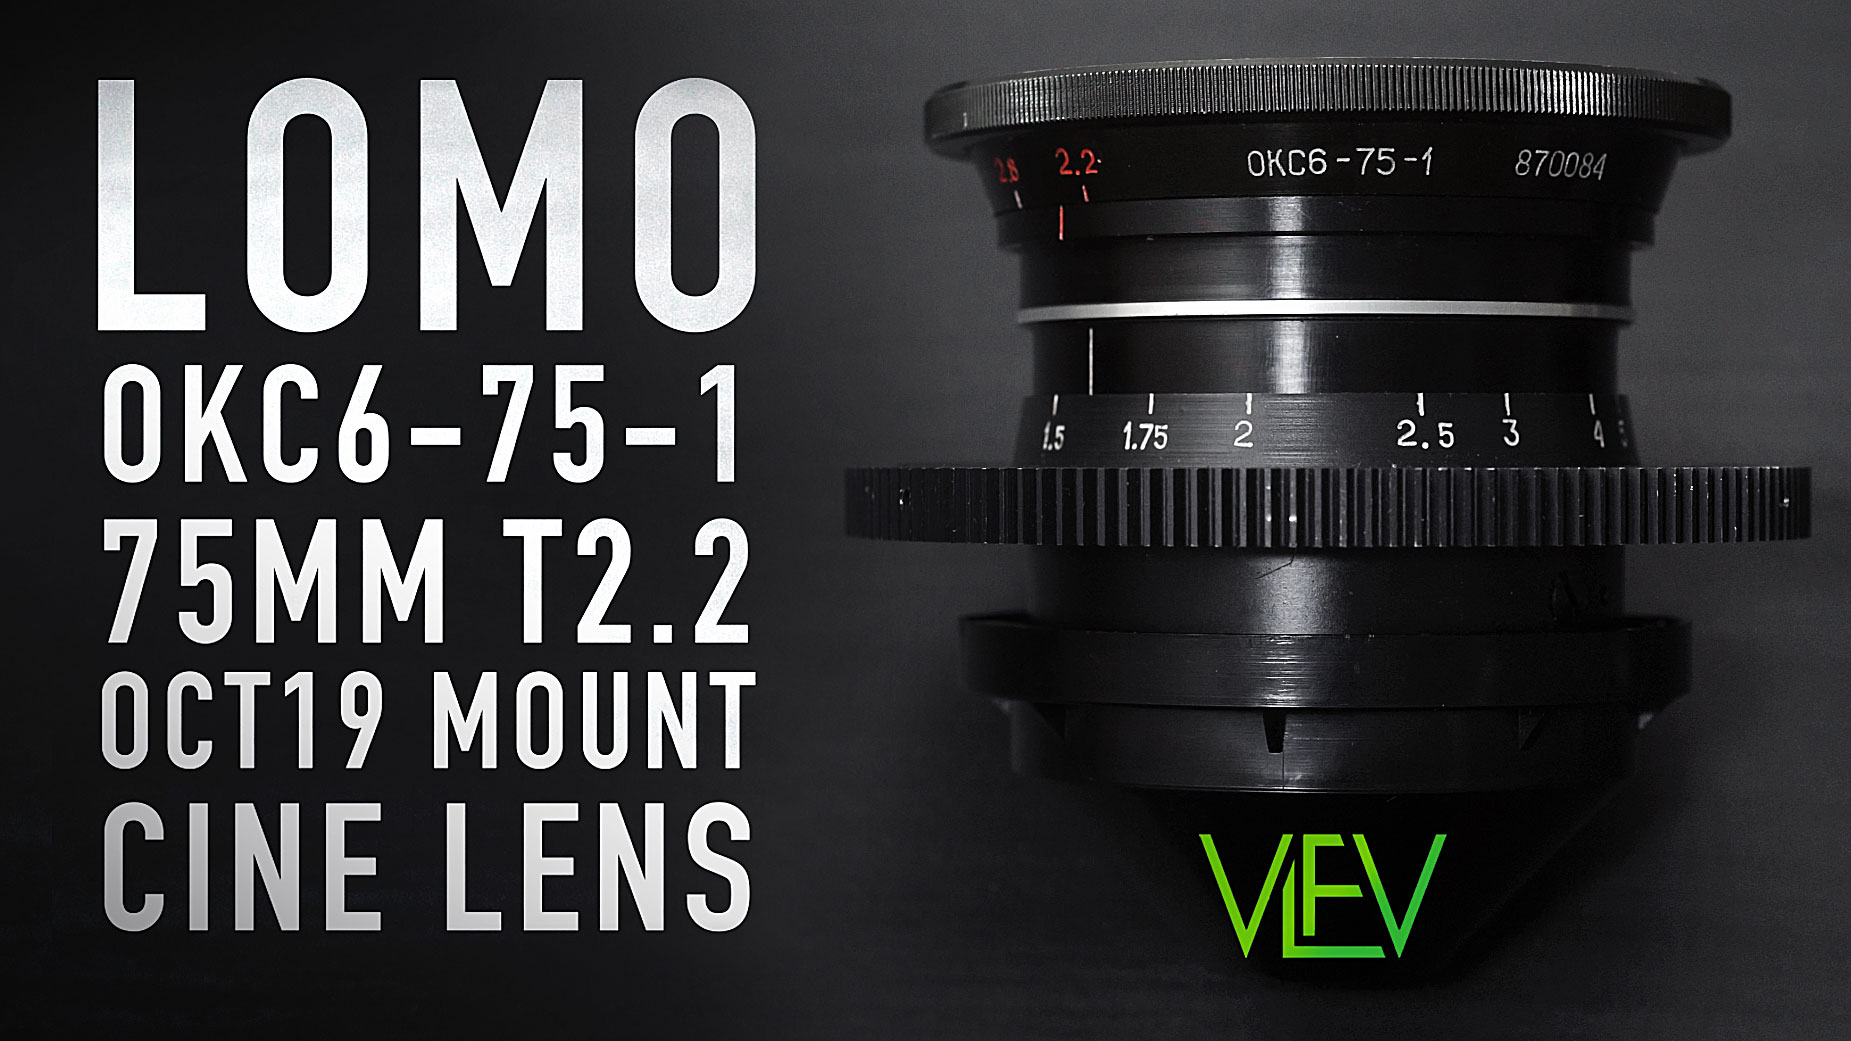 LOMO 75mm T2 2 OCT19 Russian Cine Lens   In-Depth Review